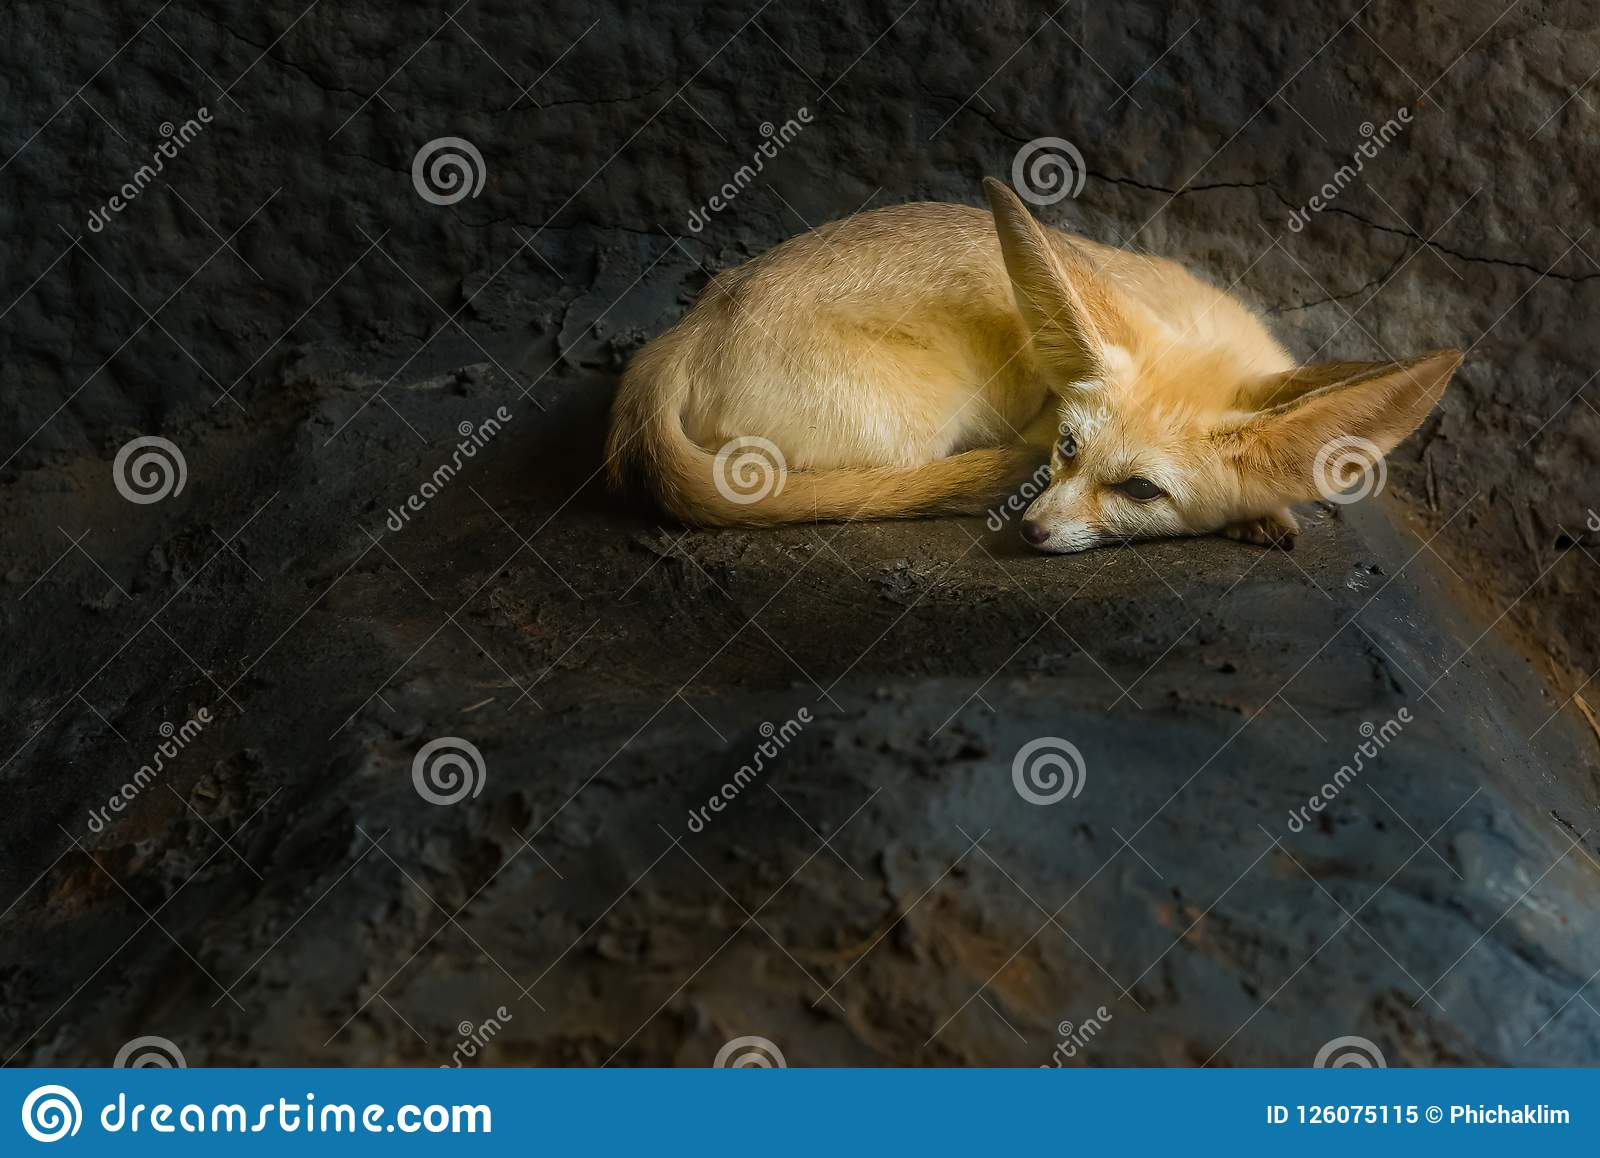 Un renard de Fennec se repose dans un repaire